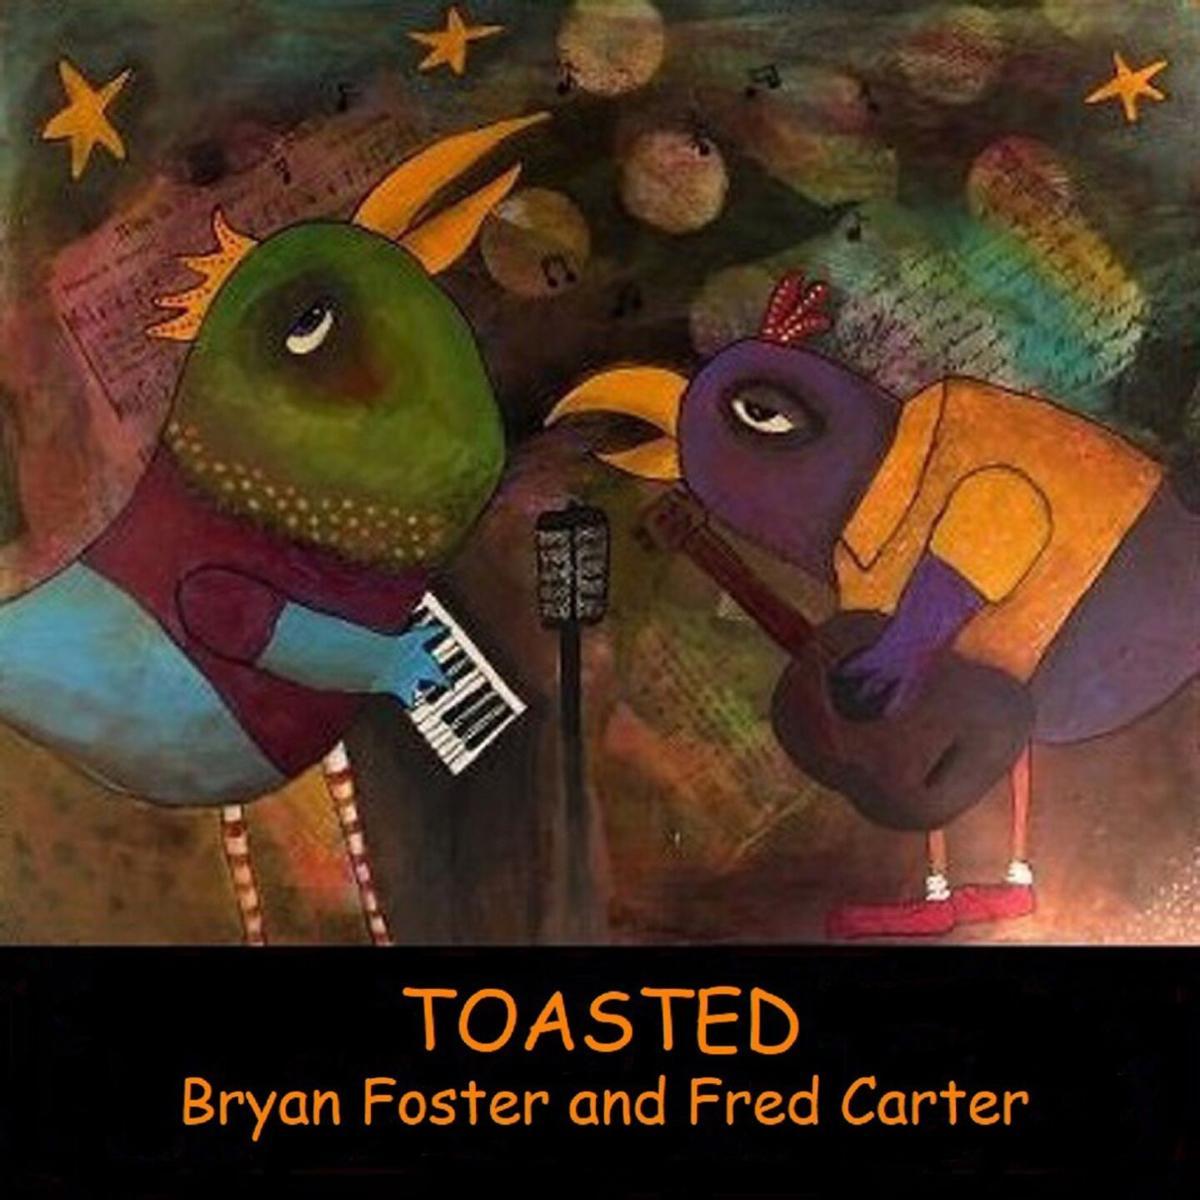 'Toasted' album cover